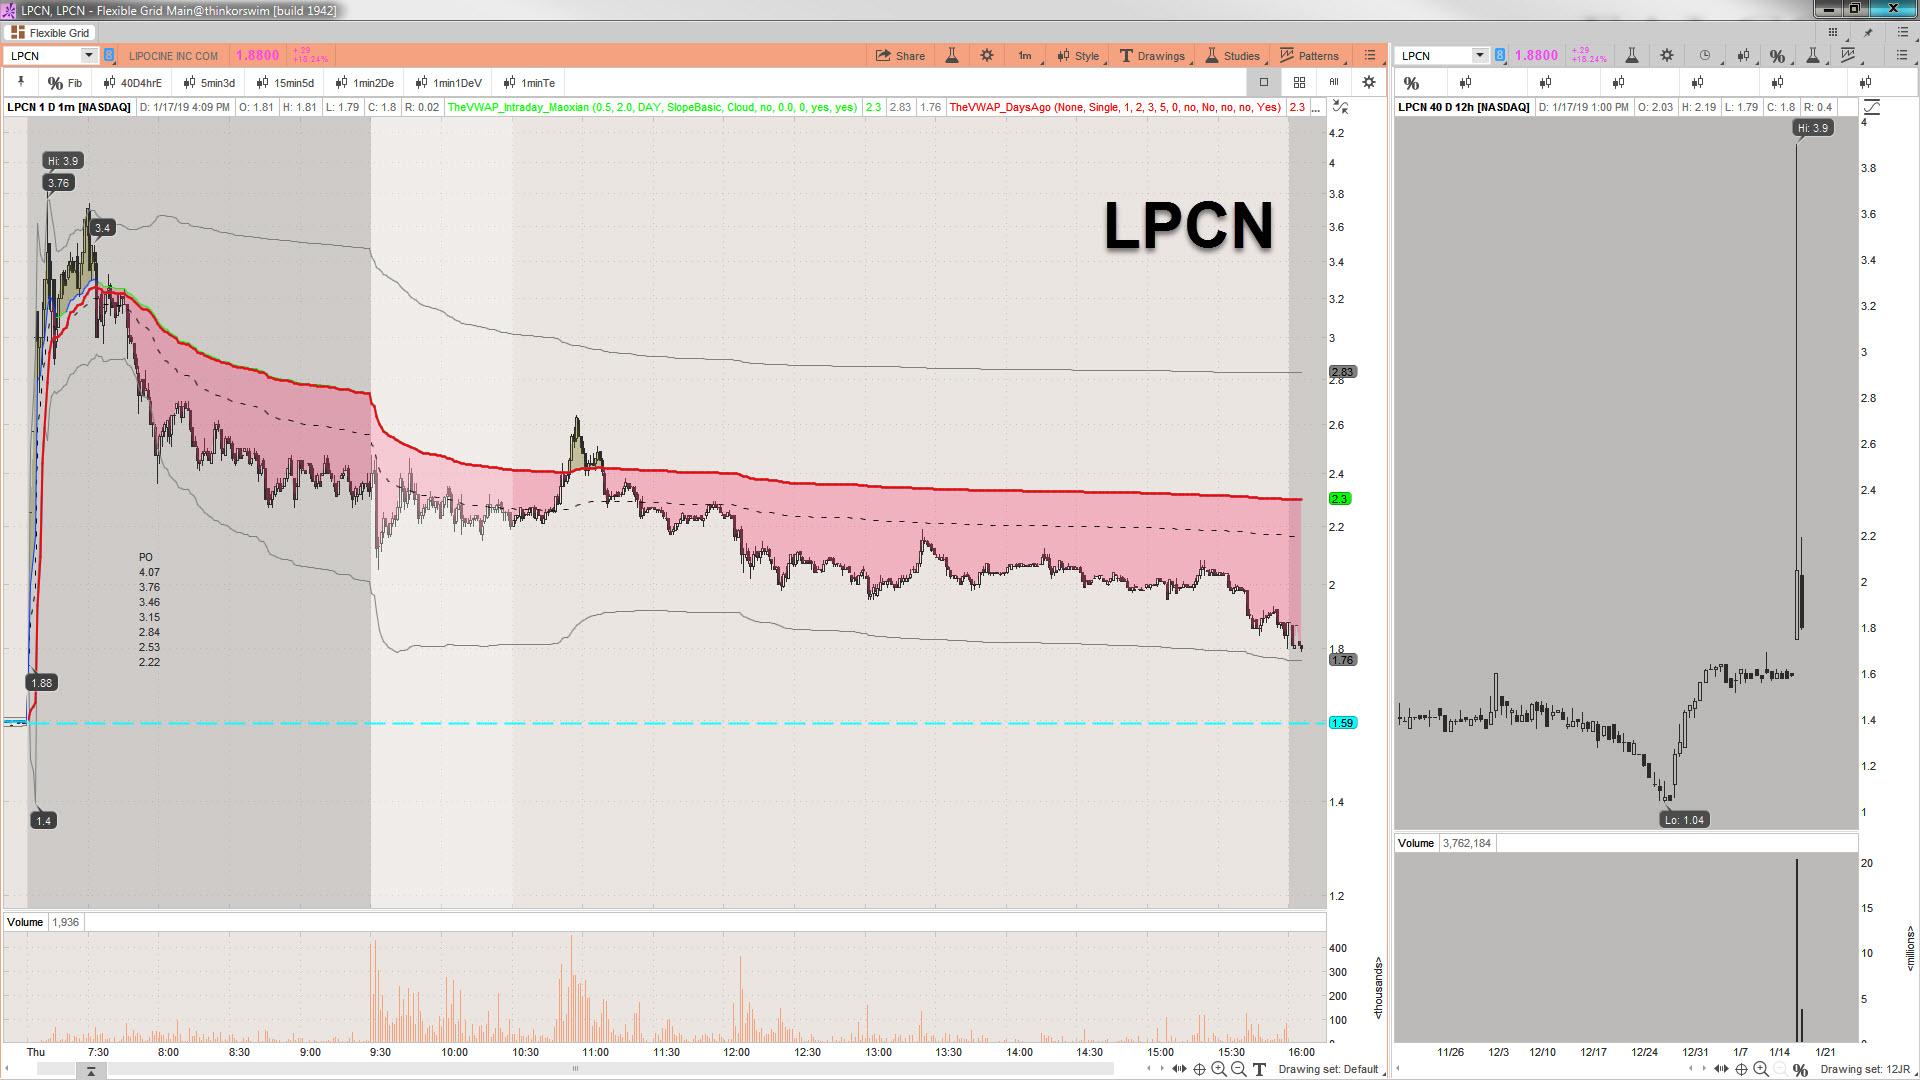 2019-01-17_16-09-31 LPCN.jpg